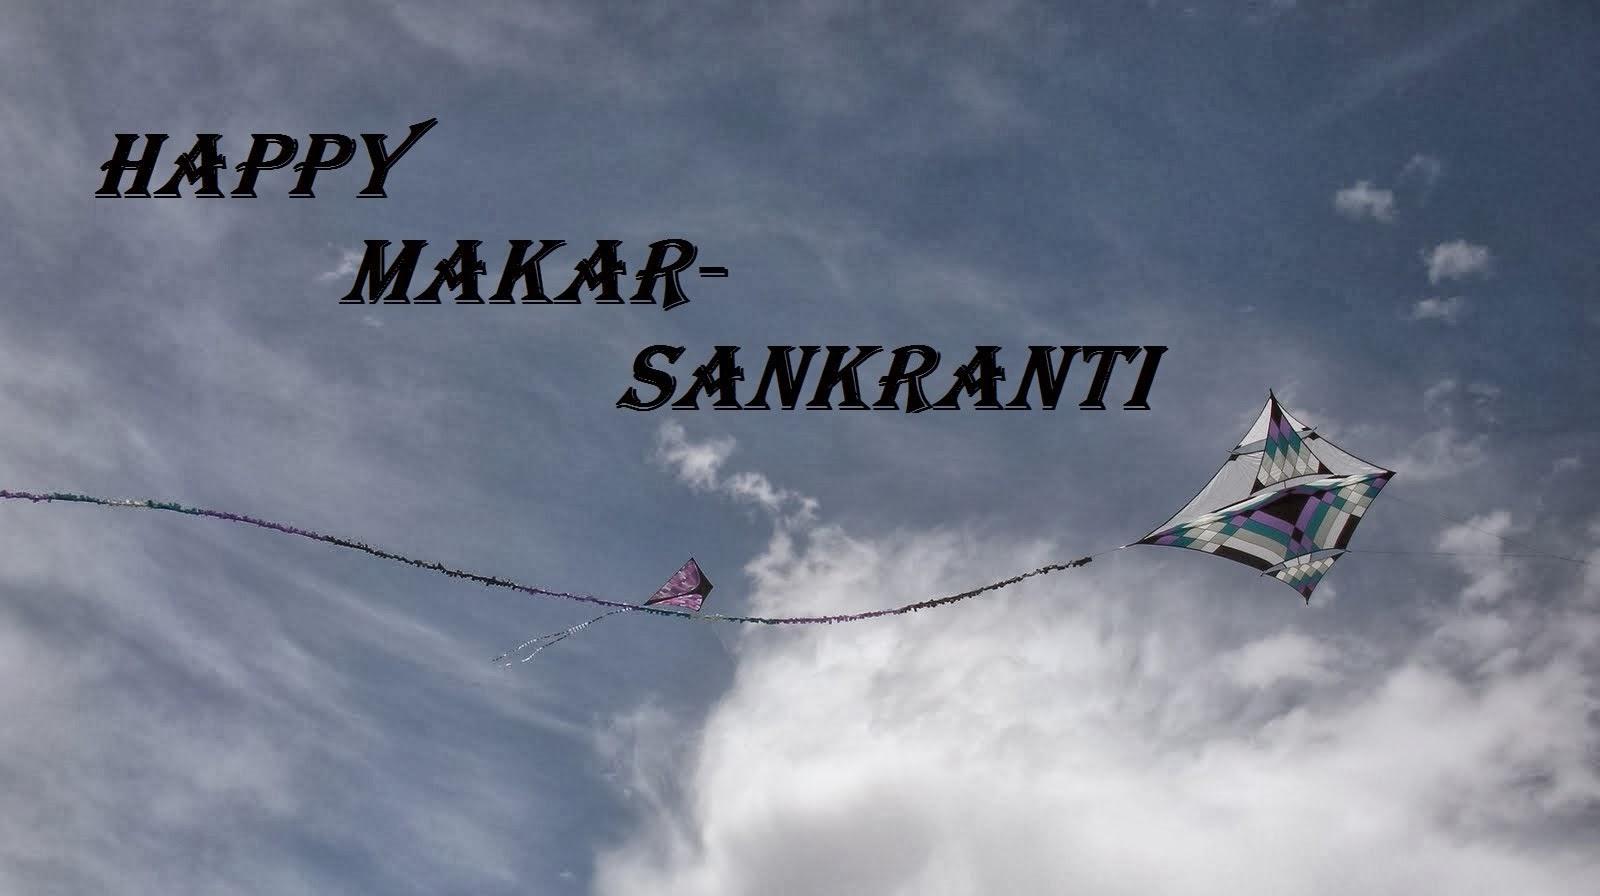 happy sankranti wallpapers - photo #30